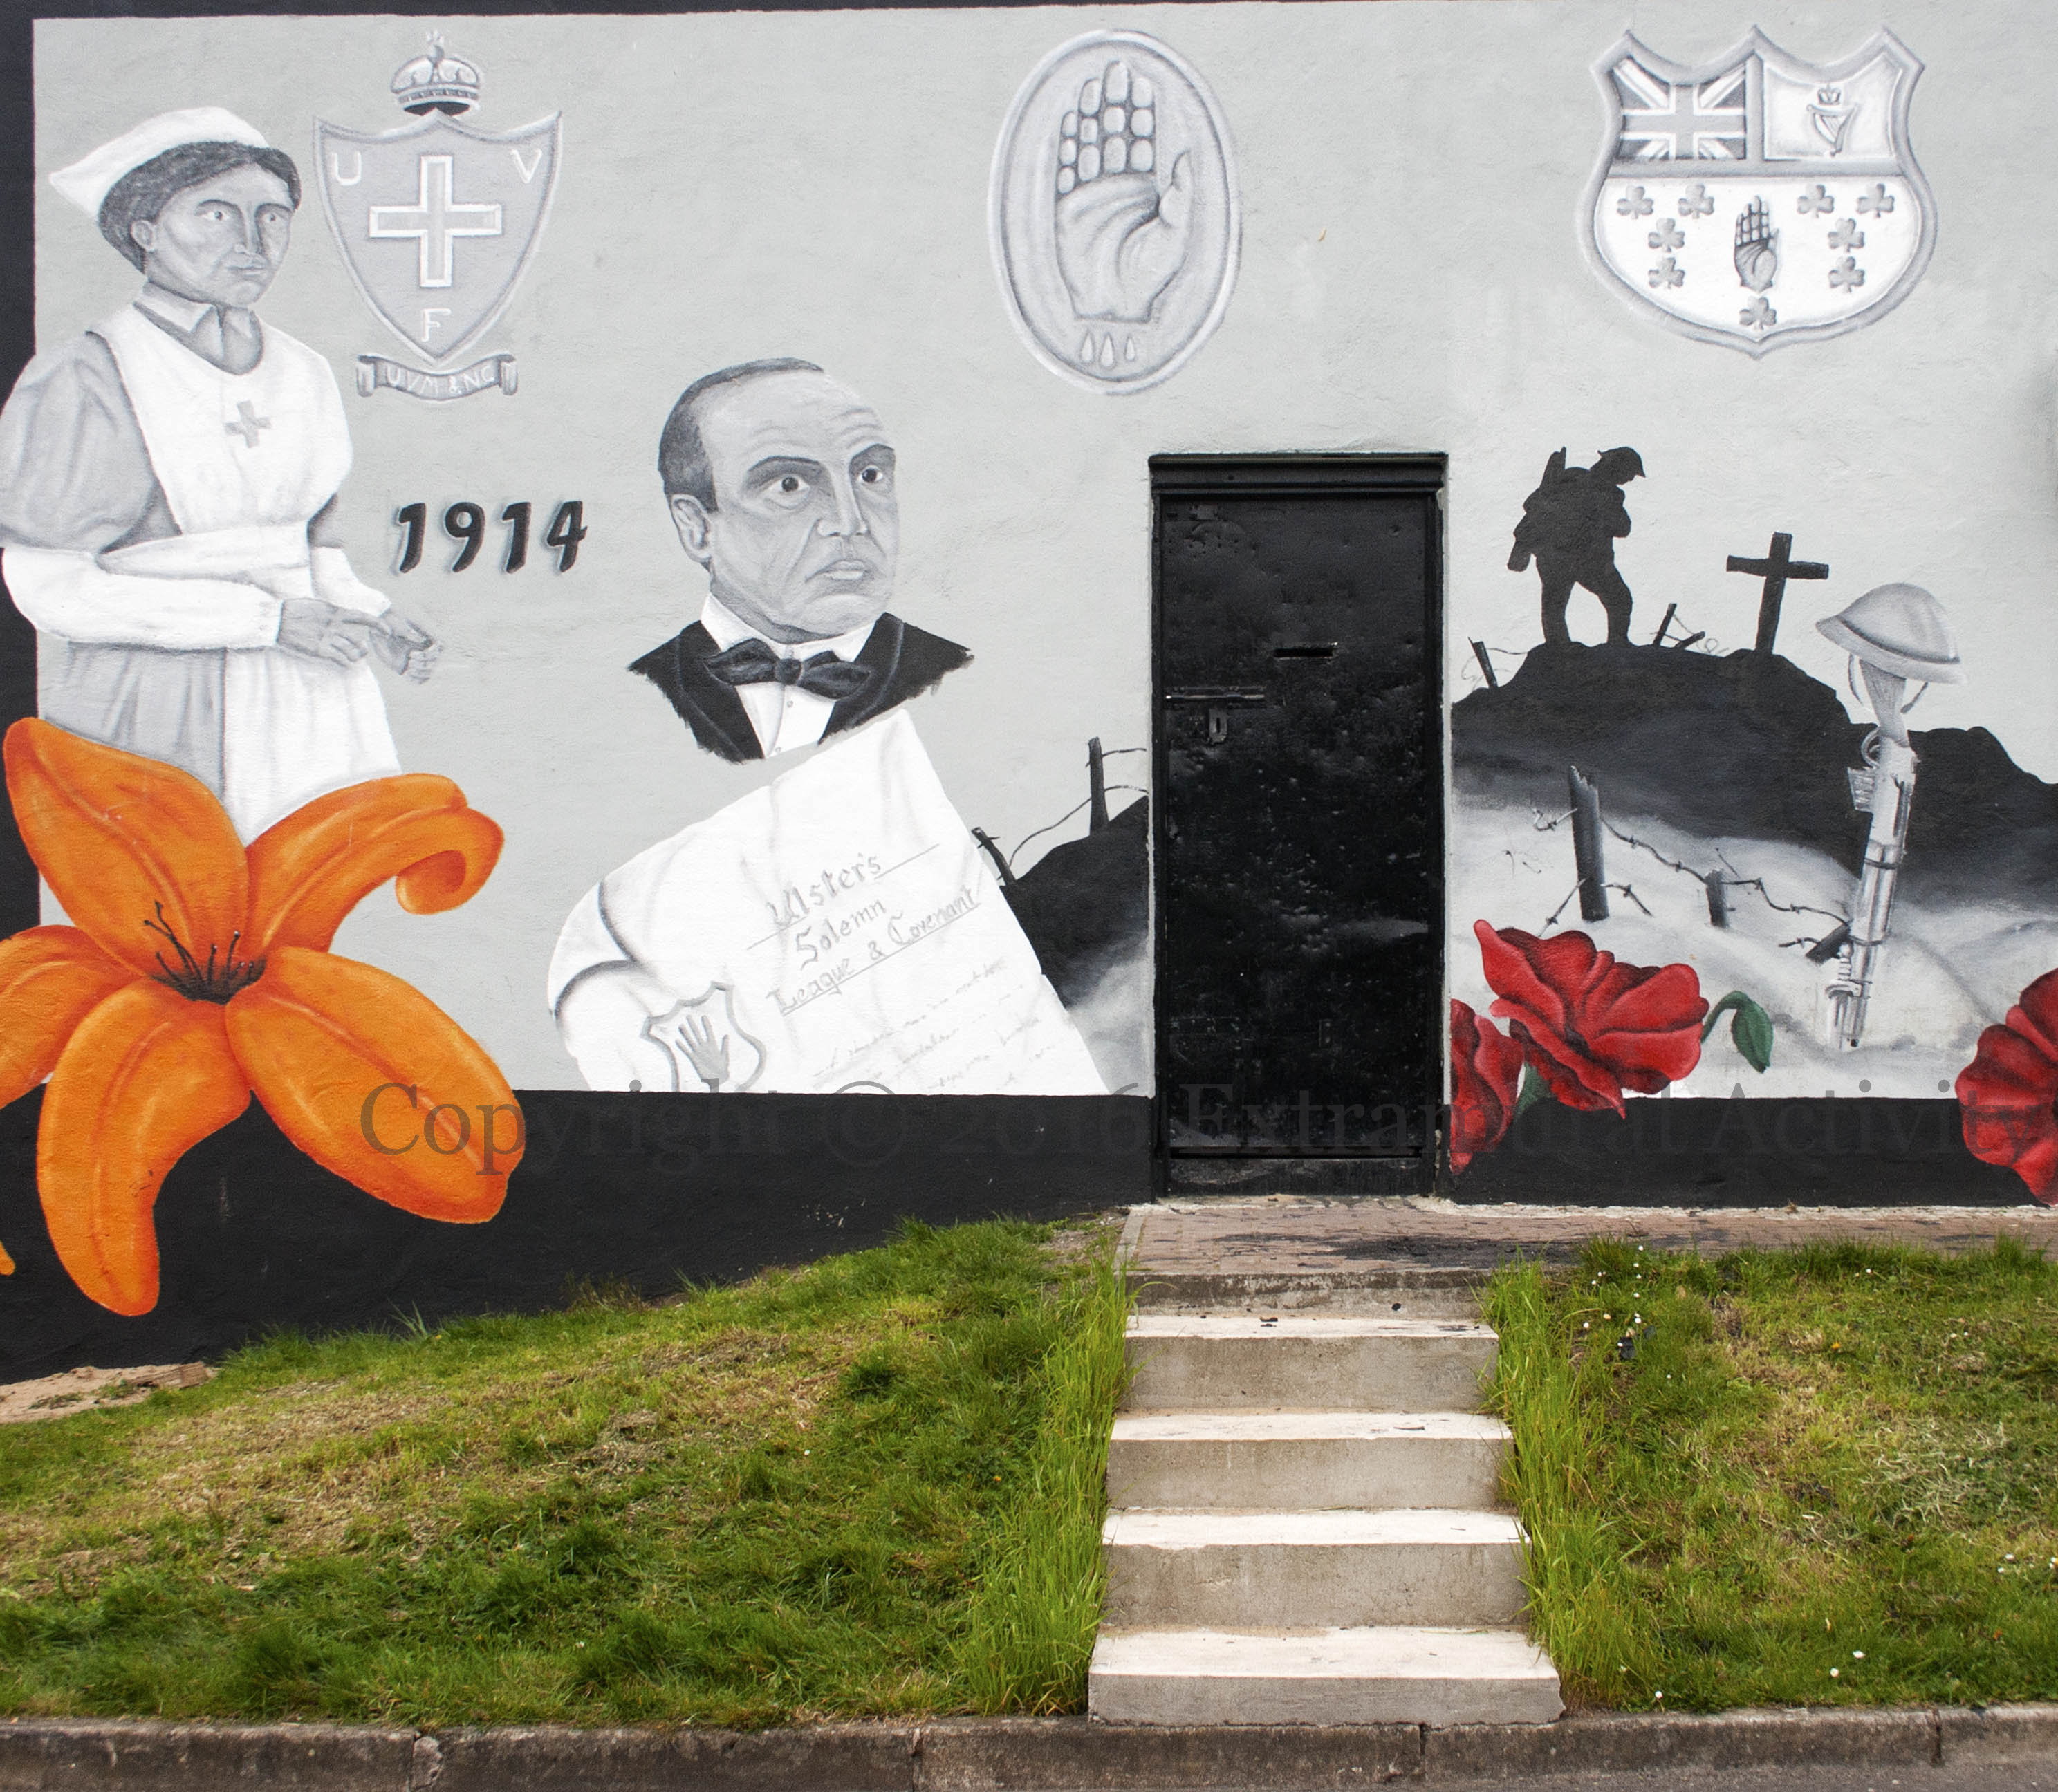 03566 2016-06-25 Ballyearl Somme l+